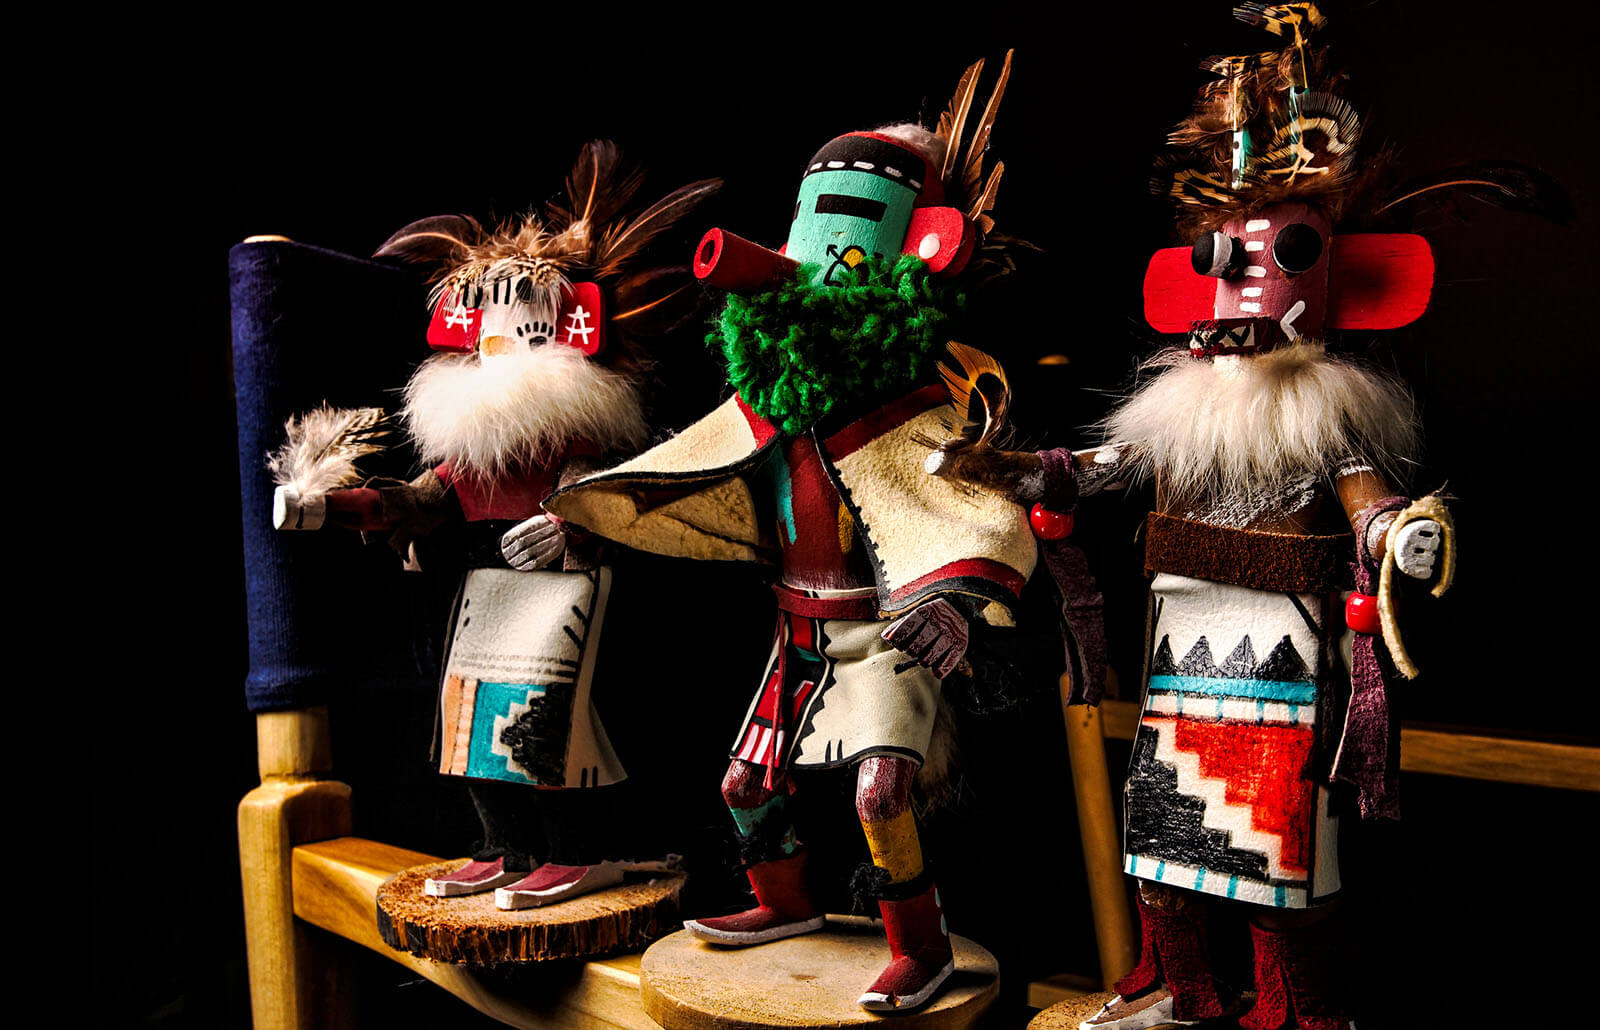 Kachina dolls collection